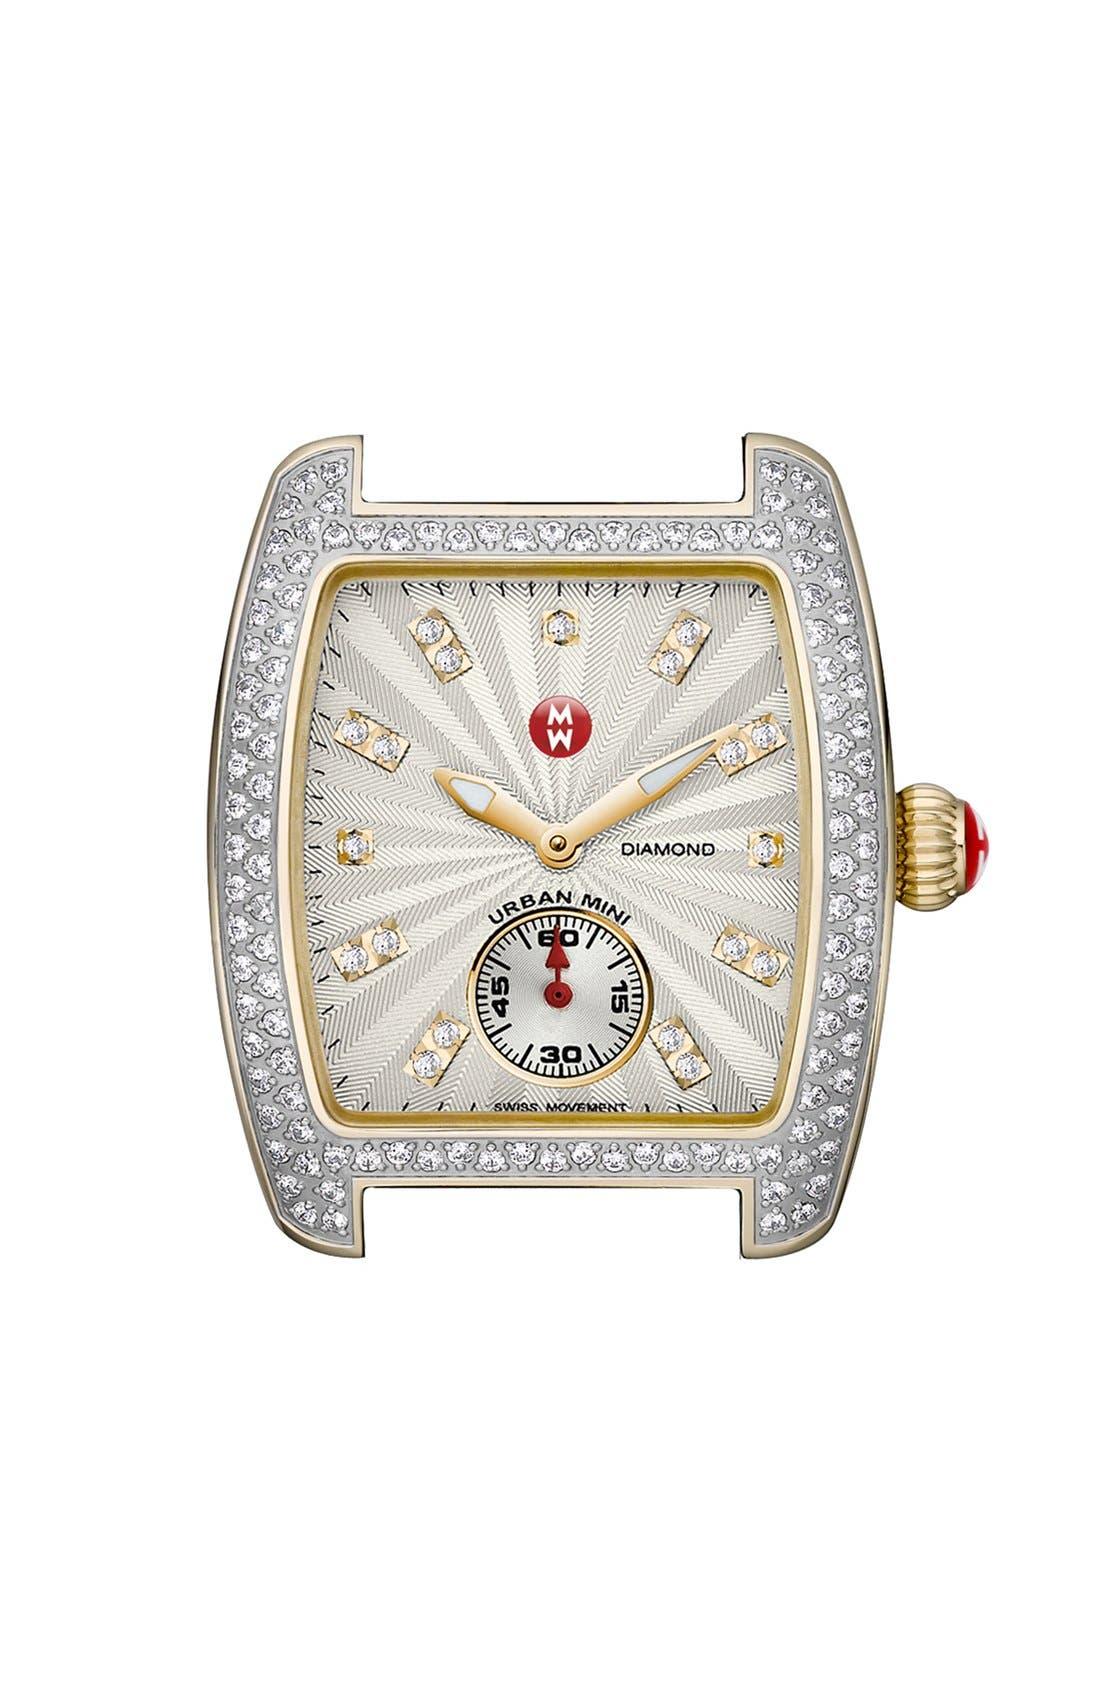 Main Image - MICHELE 'Urban Mini Diamond' Two-Tone Watch Case, 29mm x 30mm